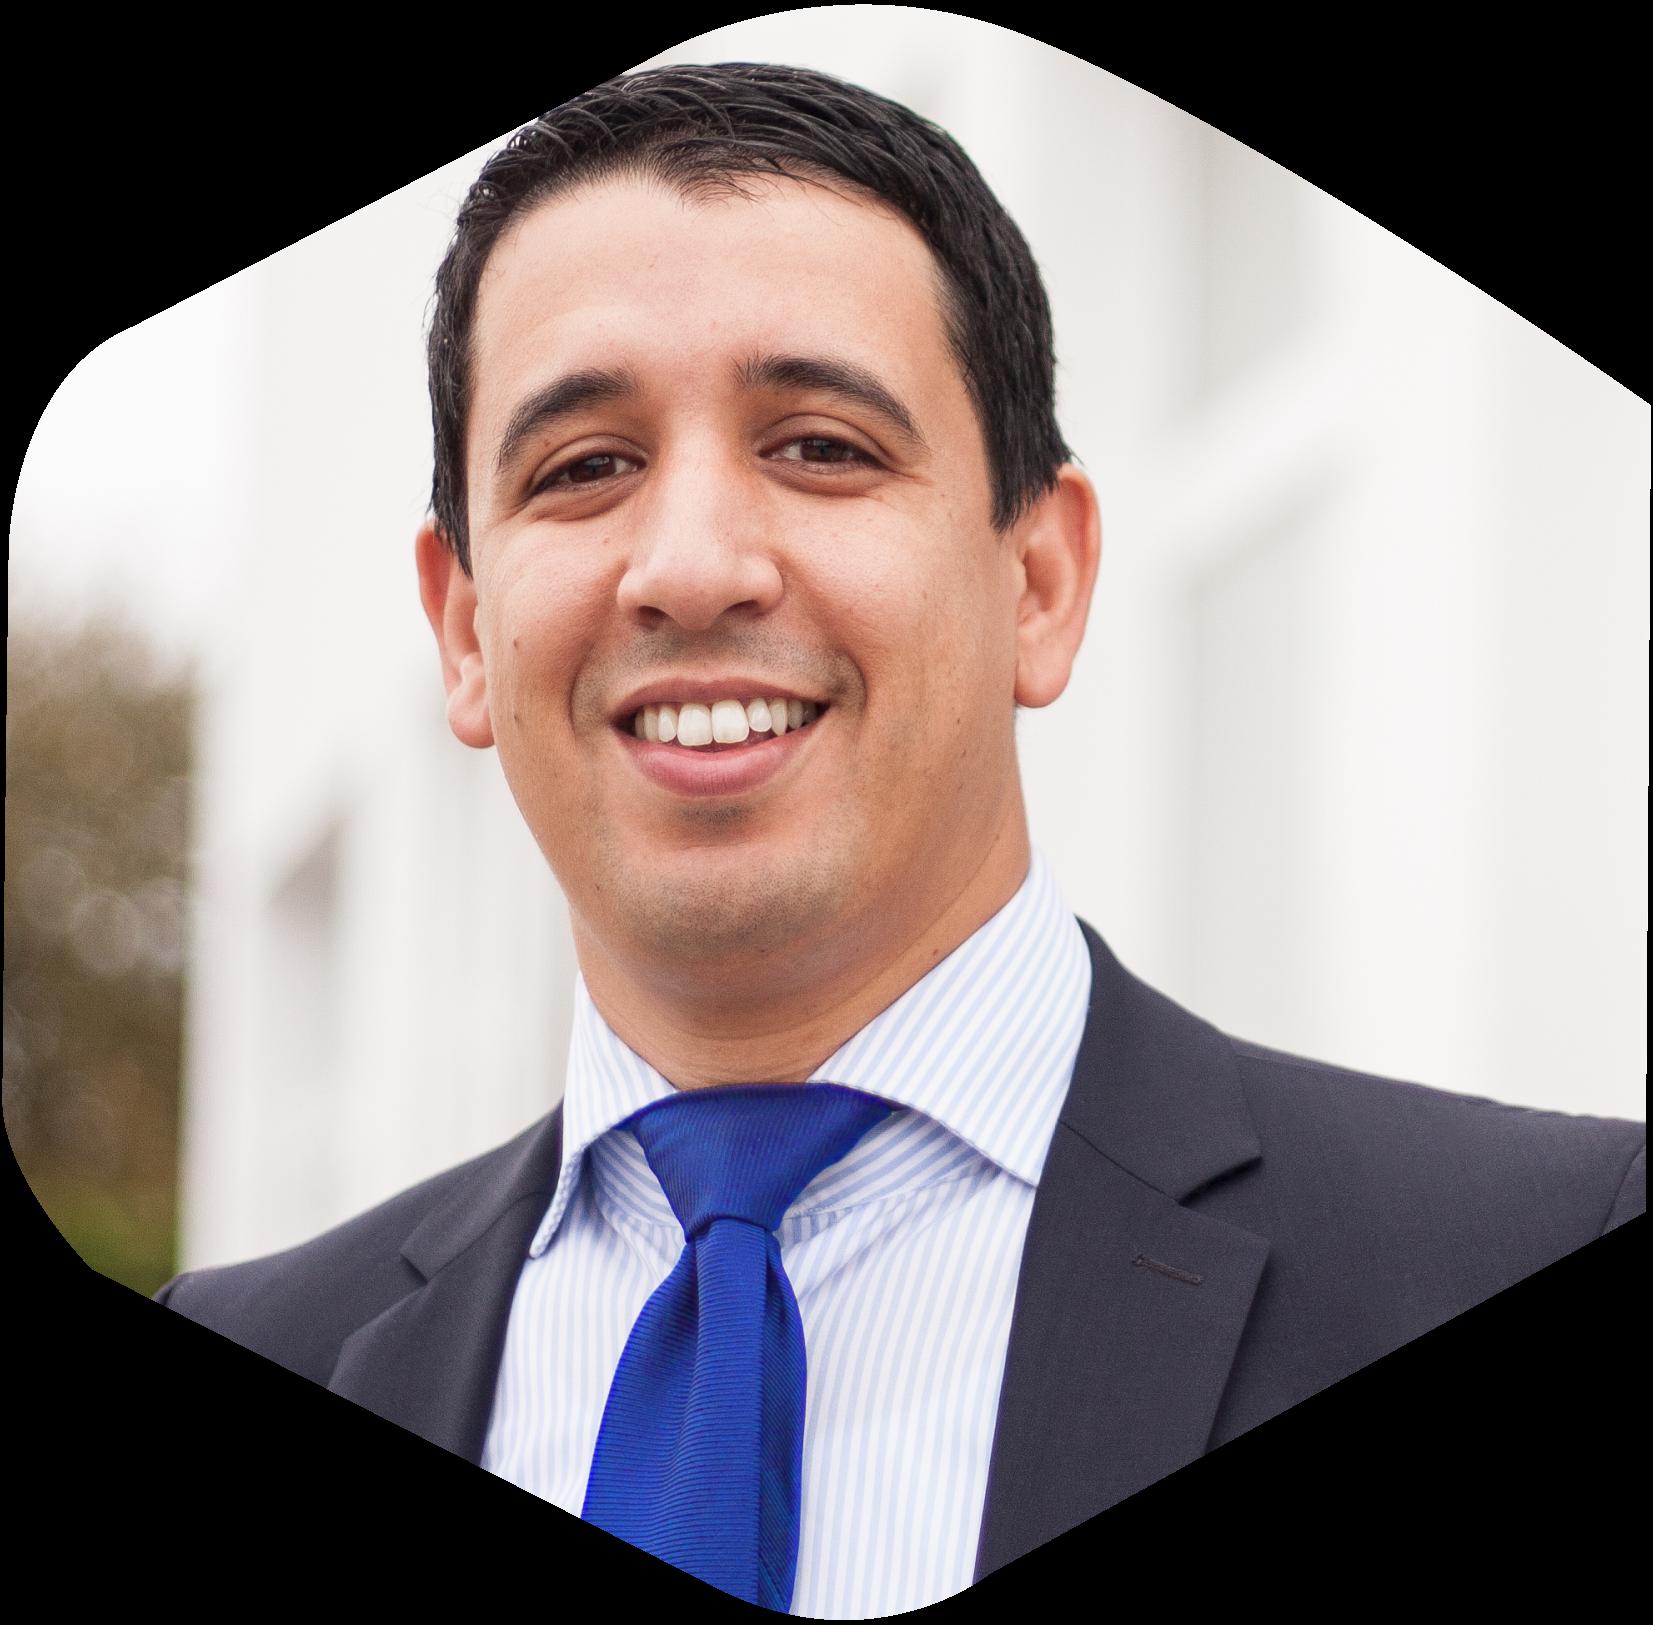 Karim Bouhlou Geschäftsführer Mergers Consulting